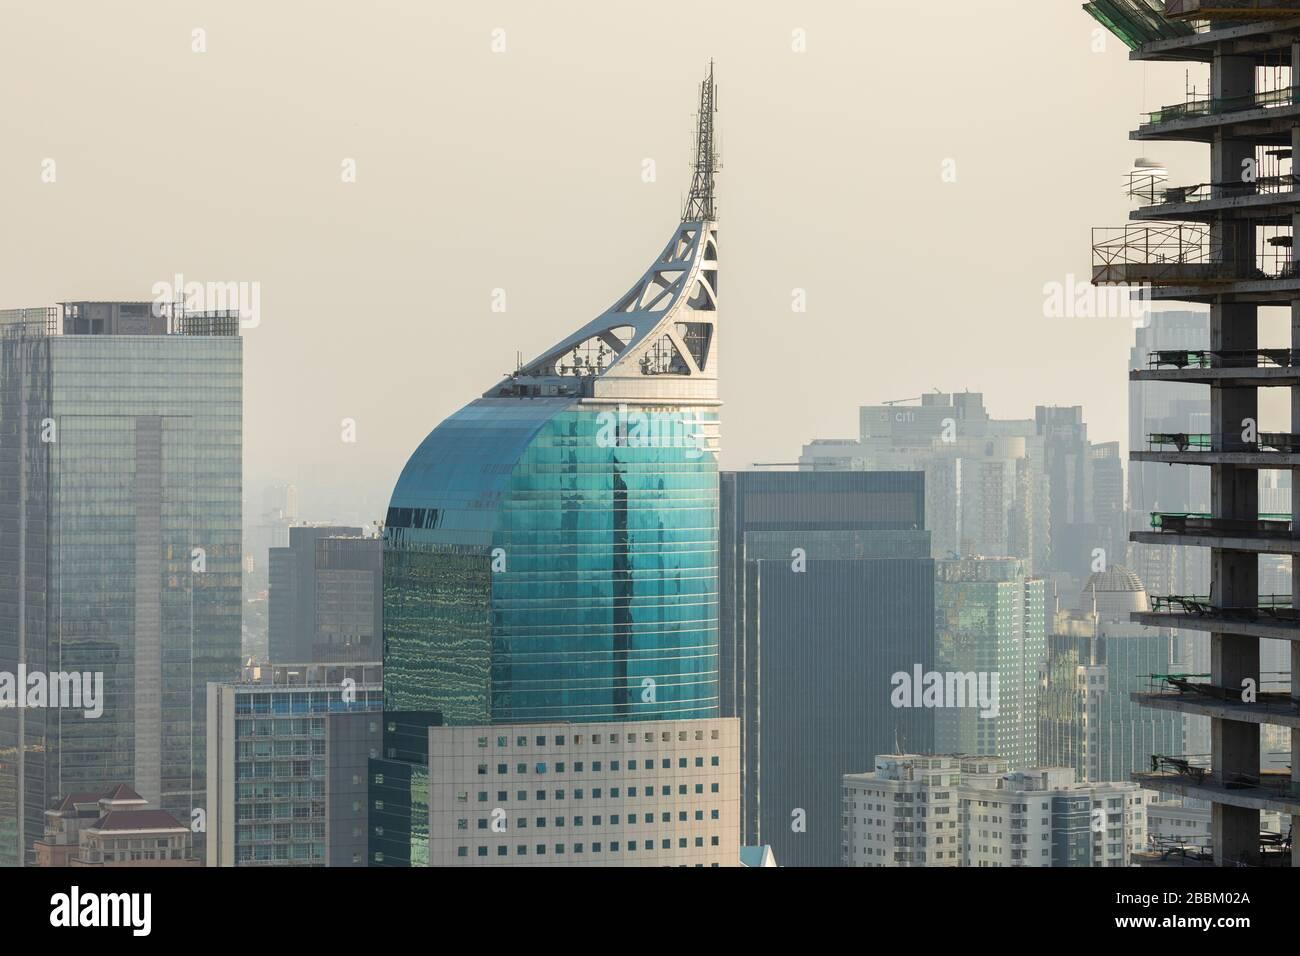 Jakarta, Indonesia - October 20, 2019: Close up of the skyline of the city of Jakarta, the capital of Indonesia, Java island, under construction. Stock Photo